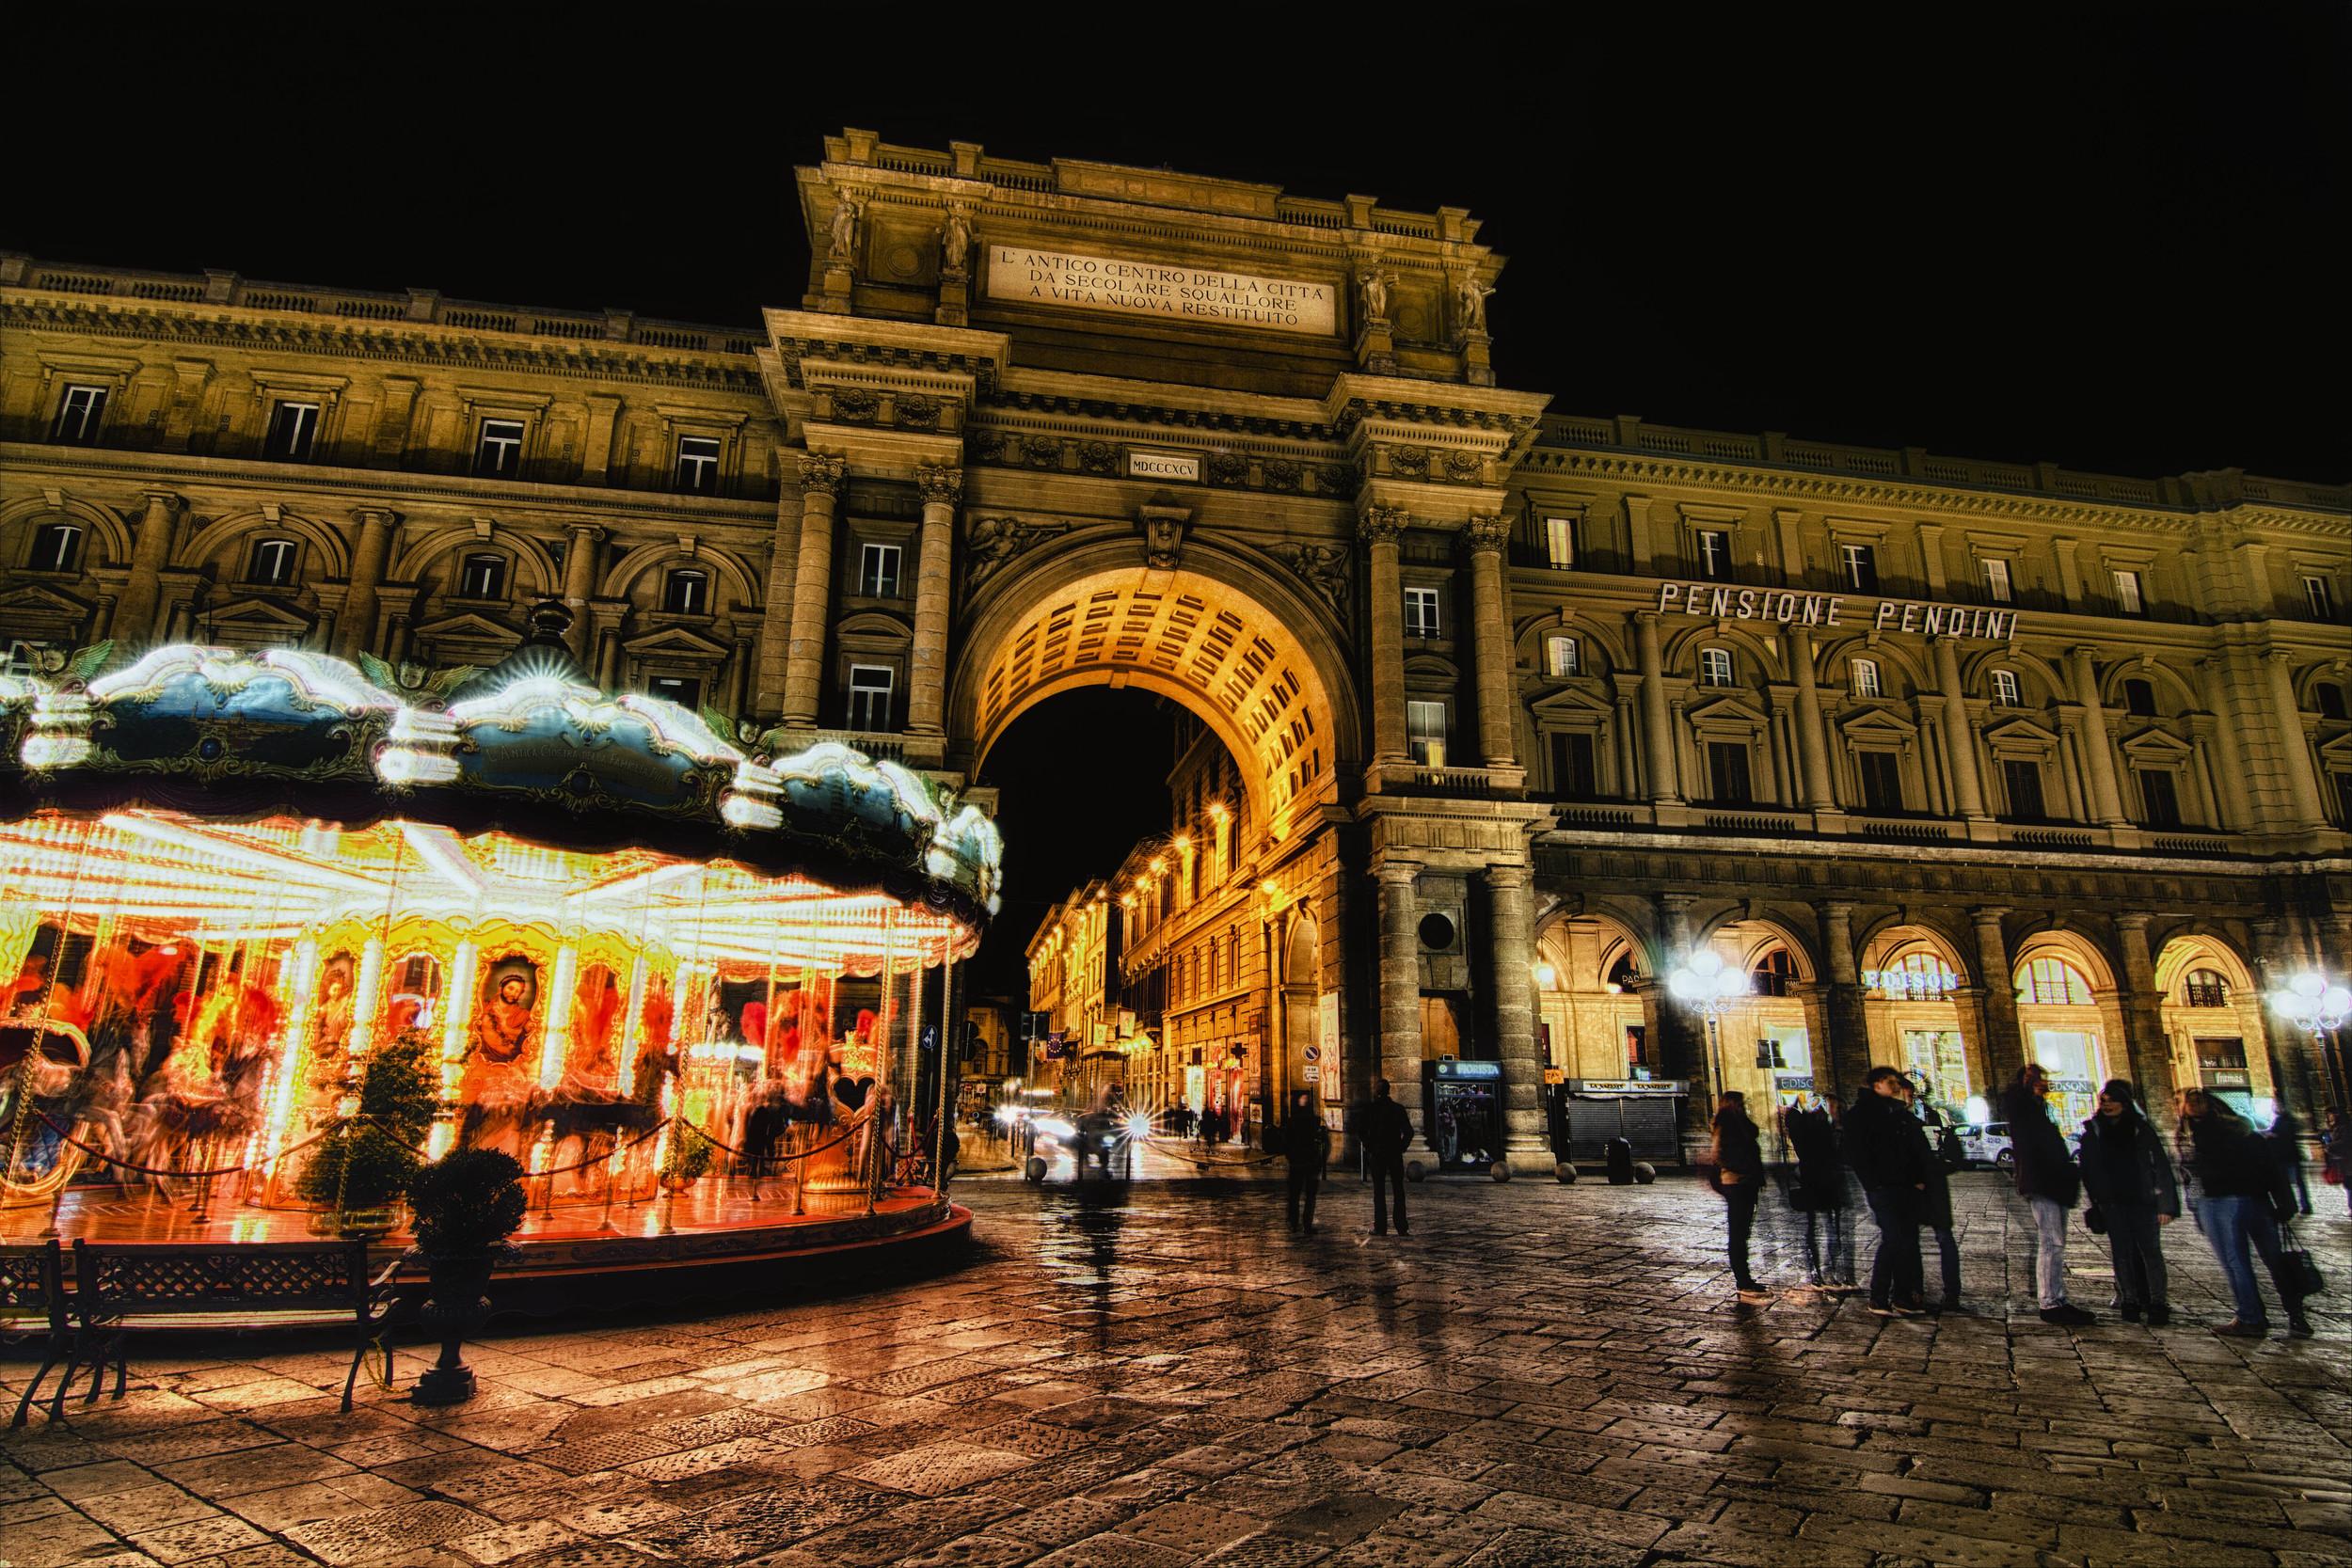 Florence+Italy+Feb+12-26-861-8-2090007219-O.jpg